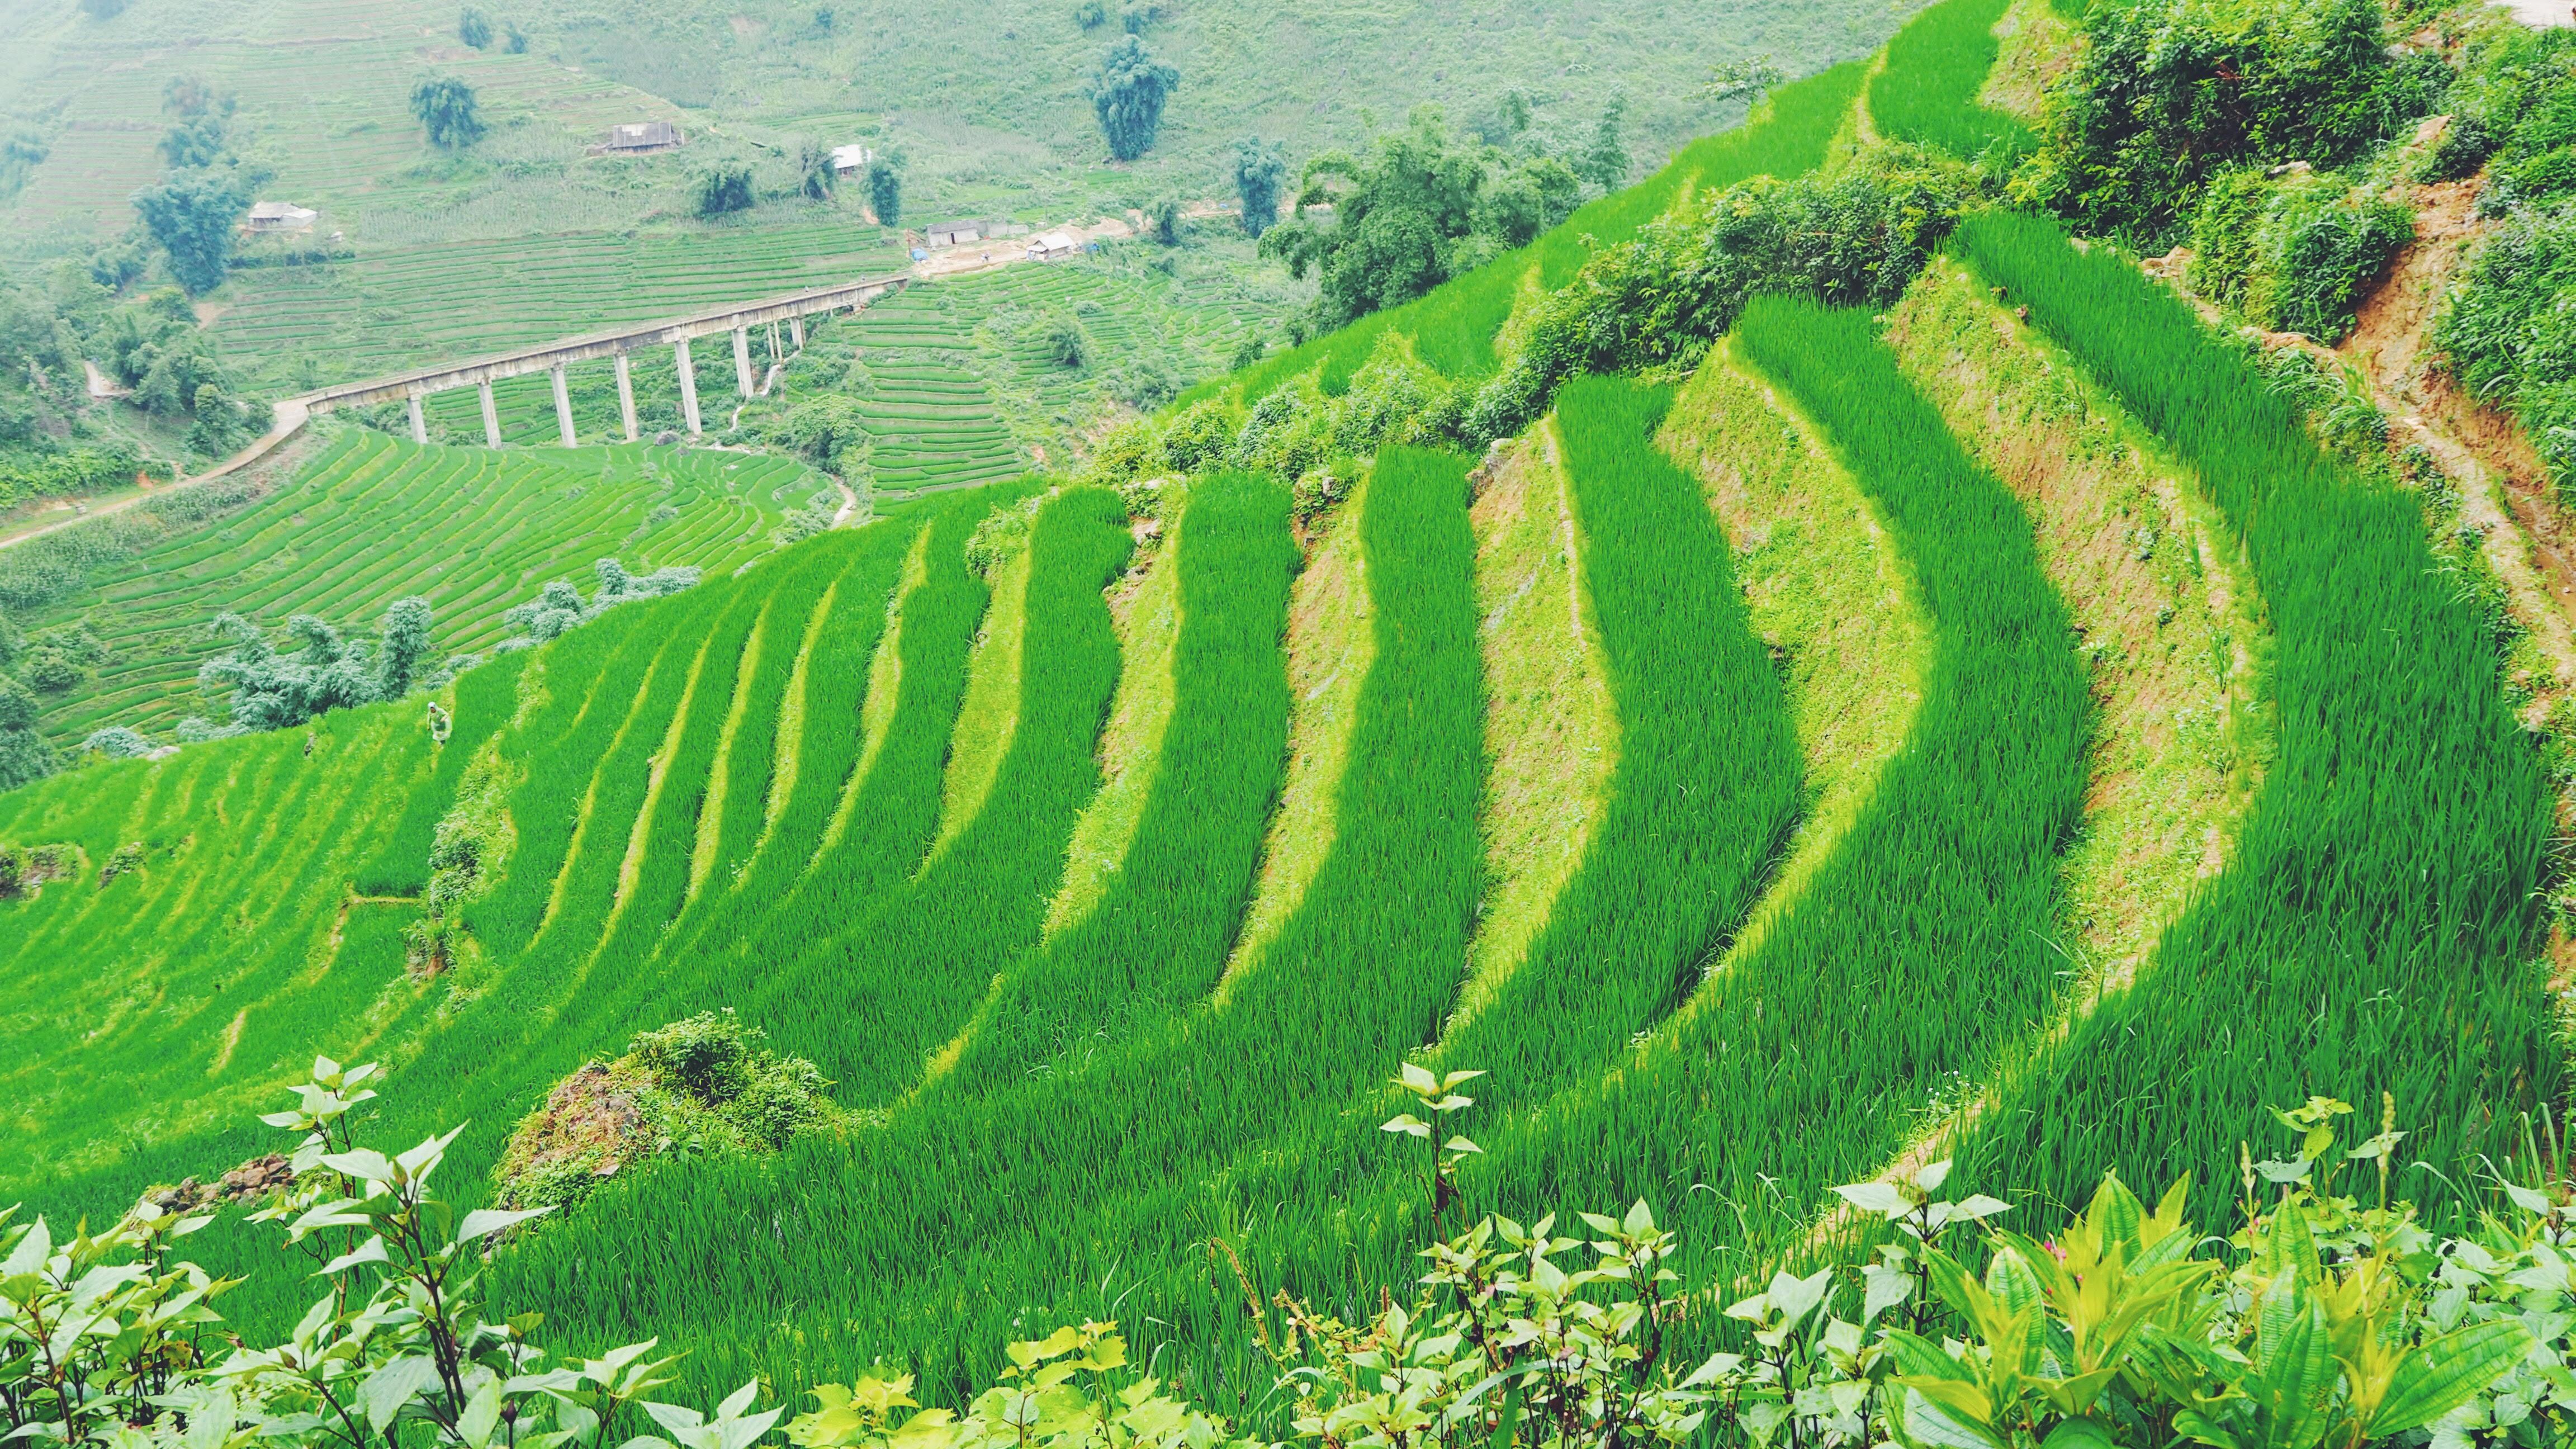 Grønt og smukt i Sapa